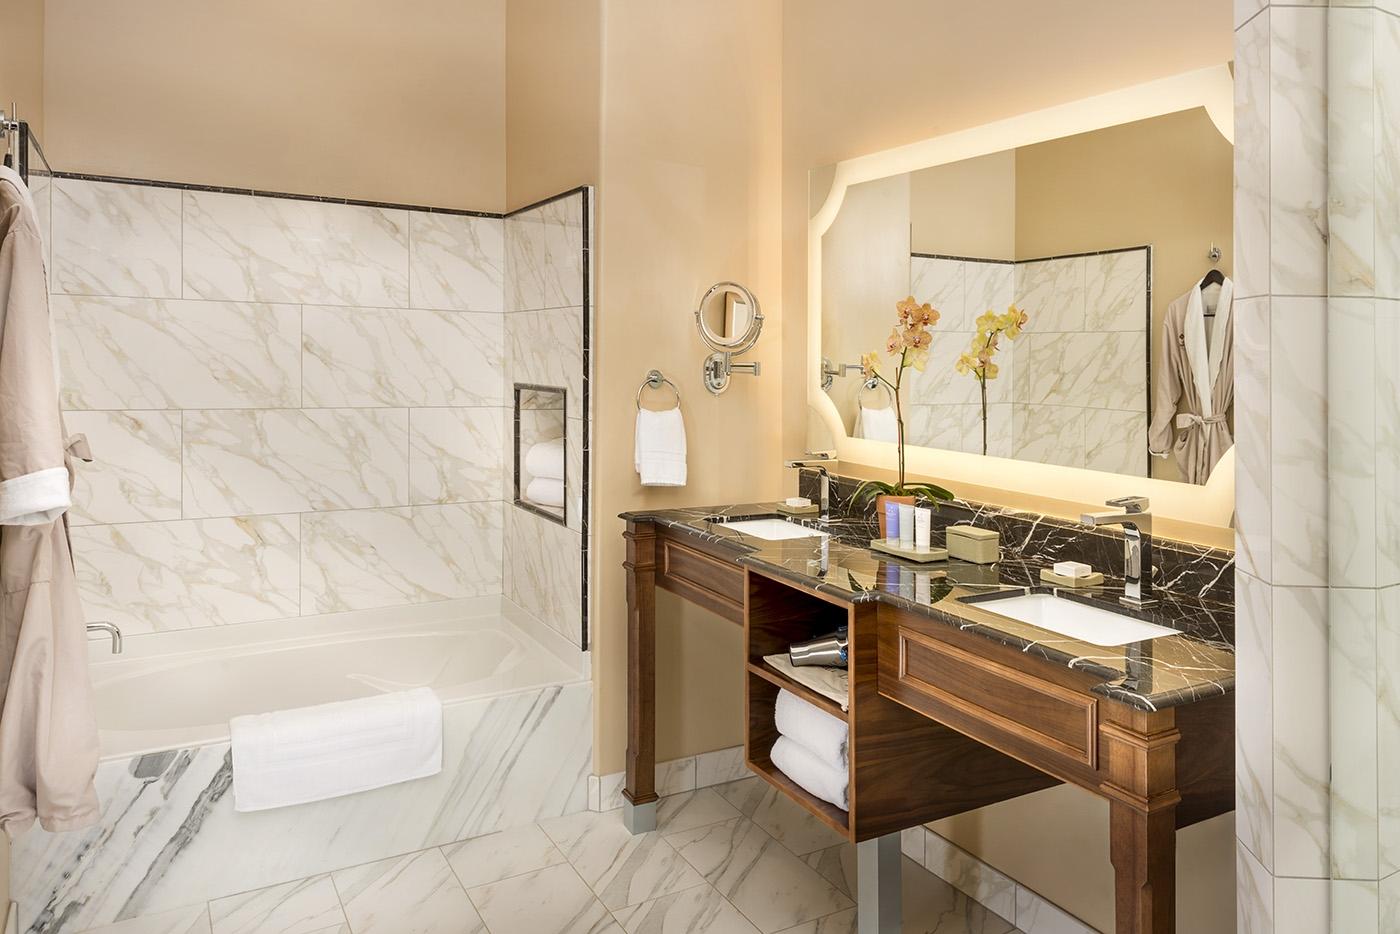 Bathroom at Allegretto Vineyard Resort in Paso Robles